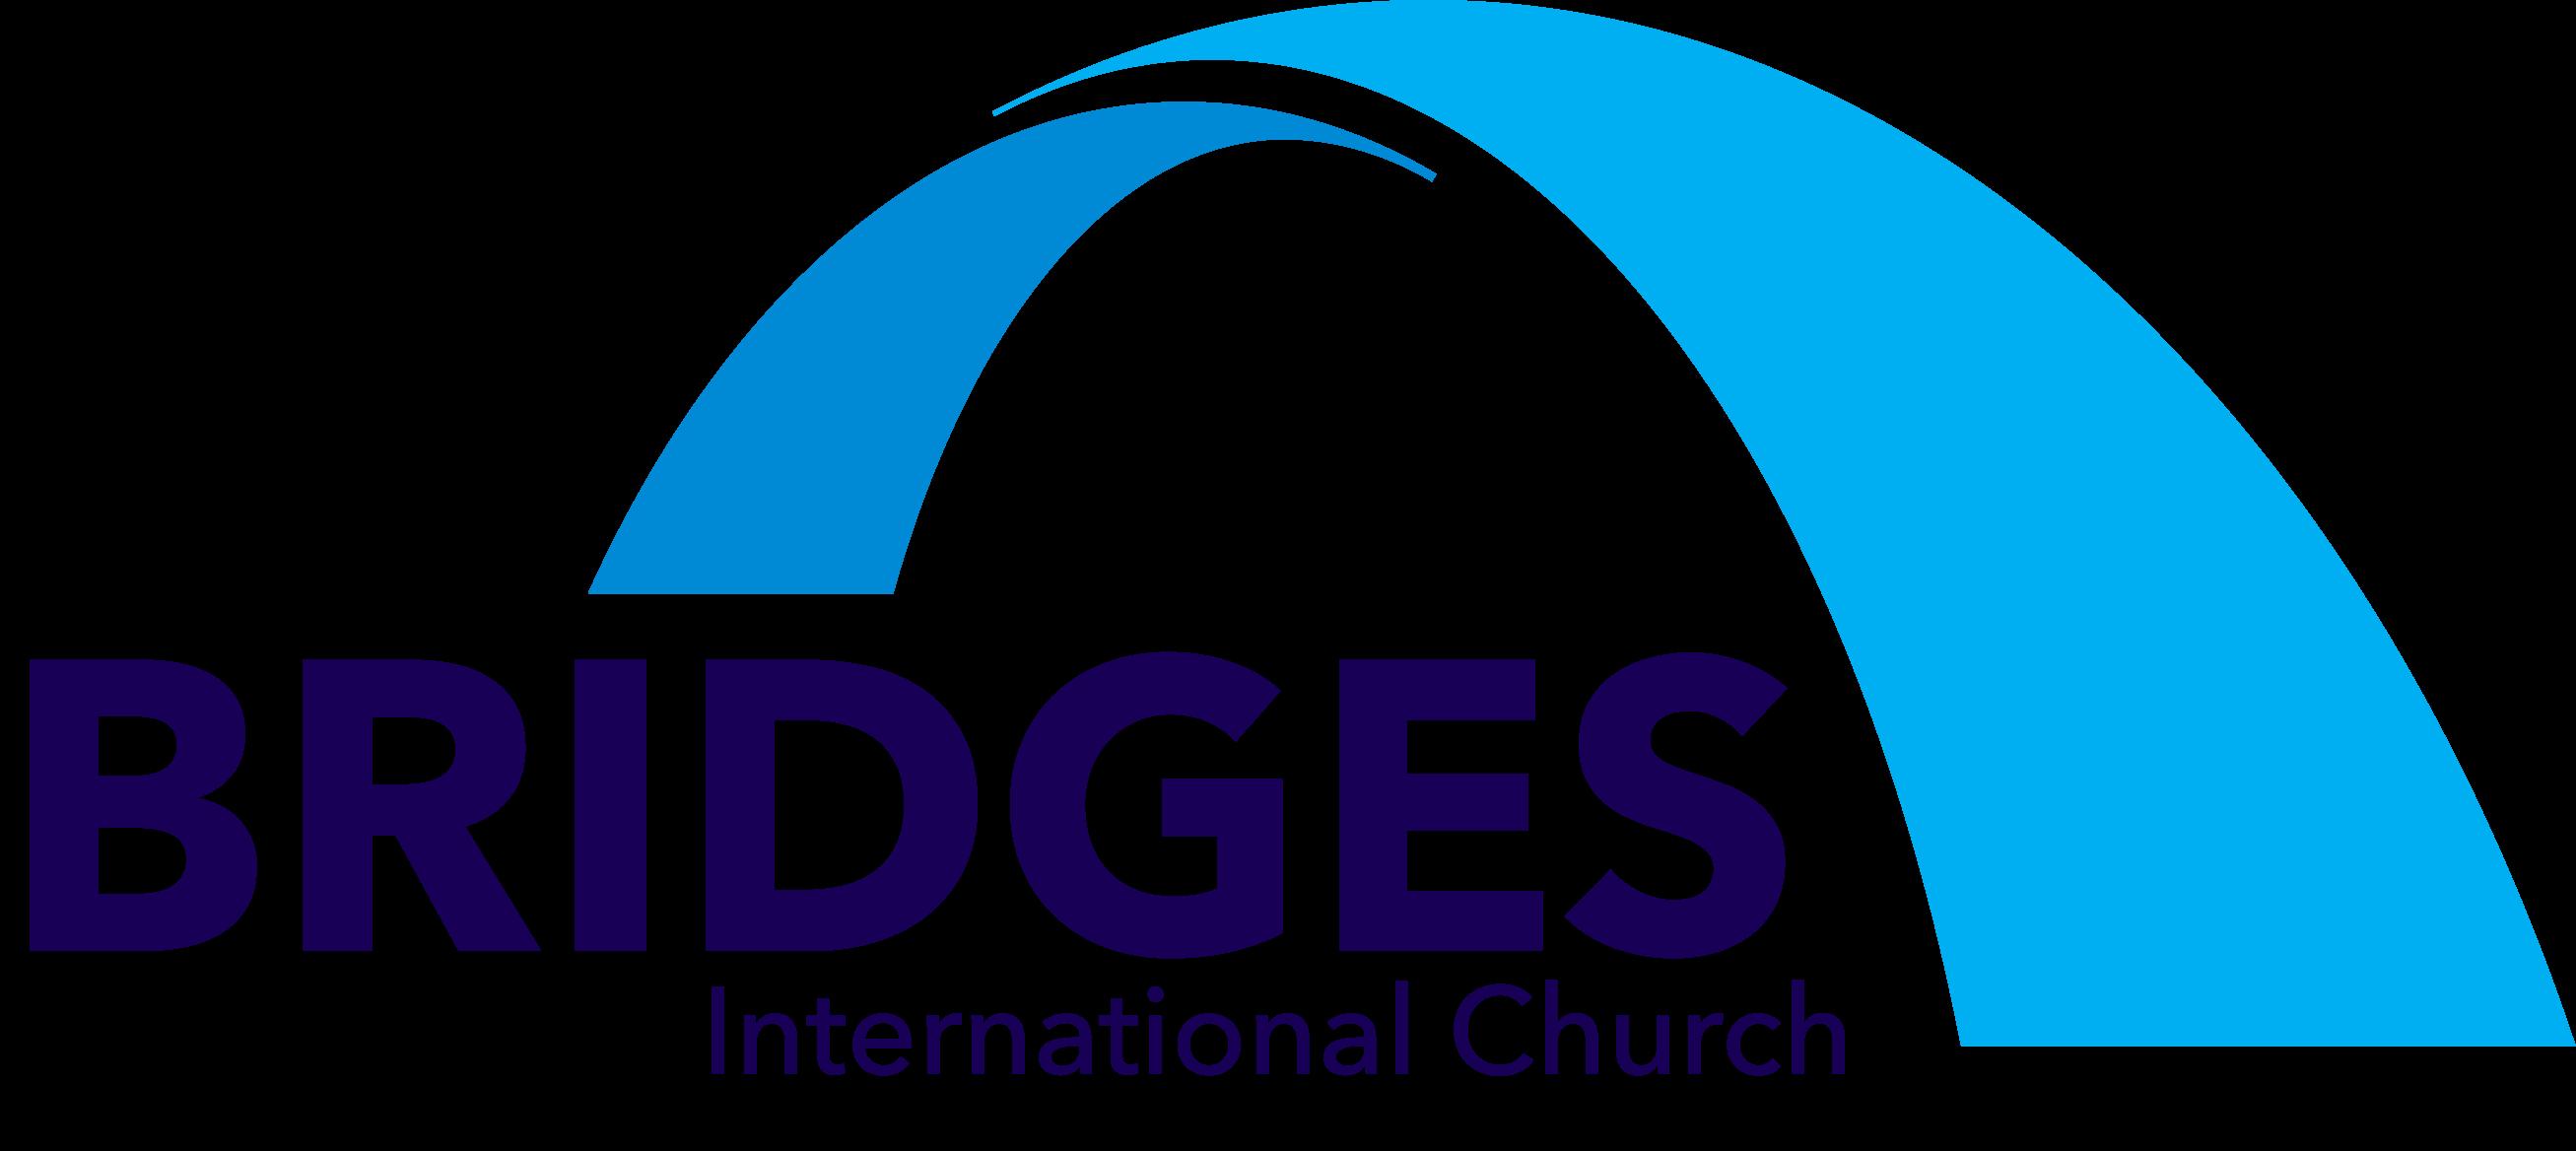 Bridges International Church